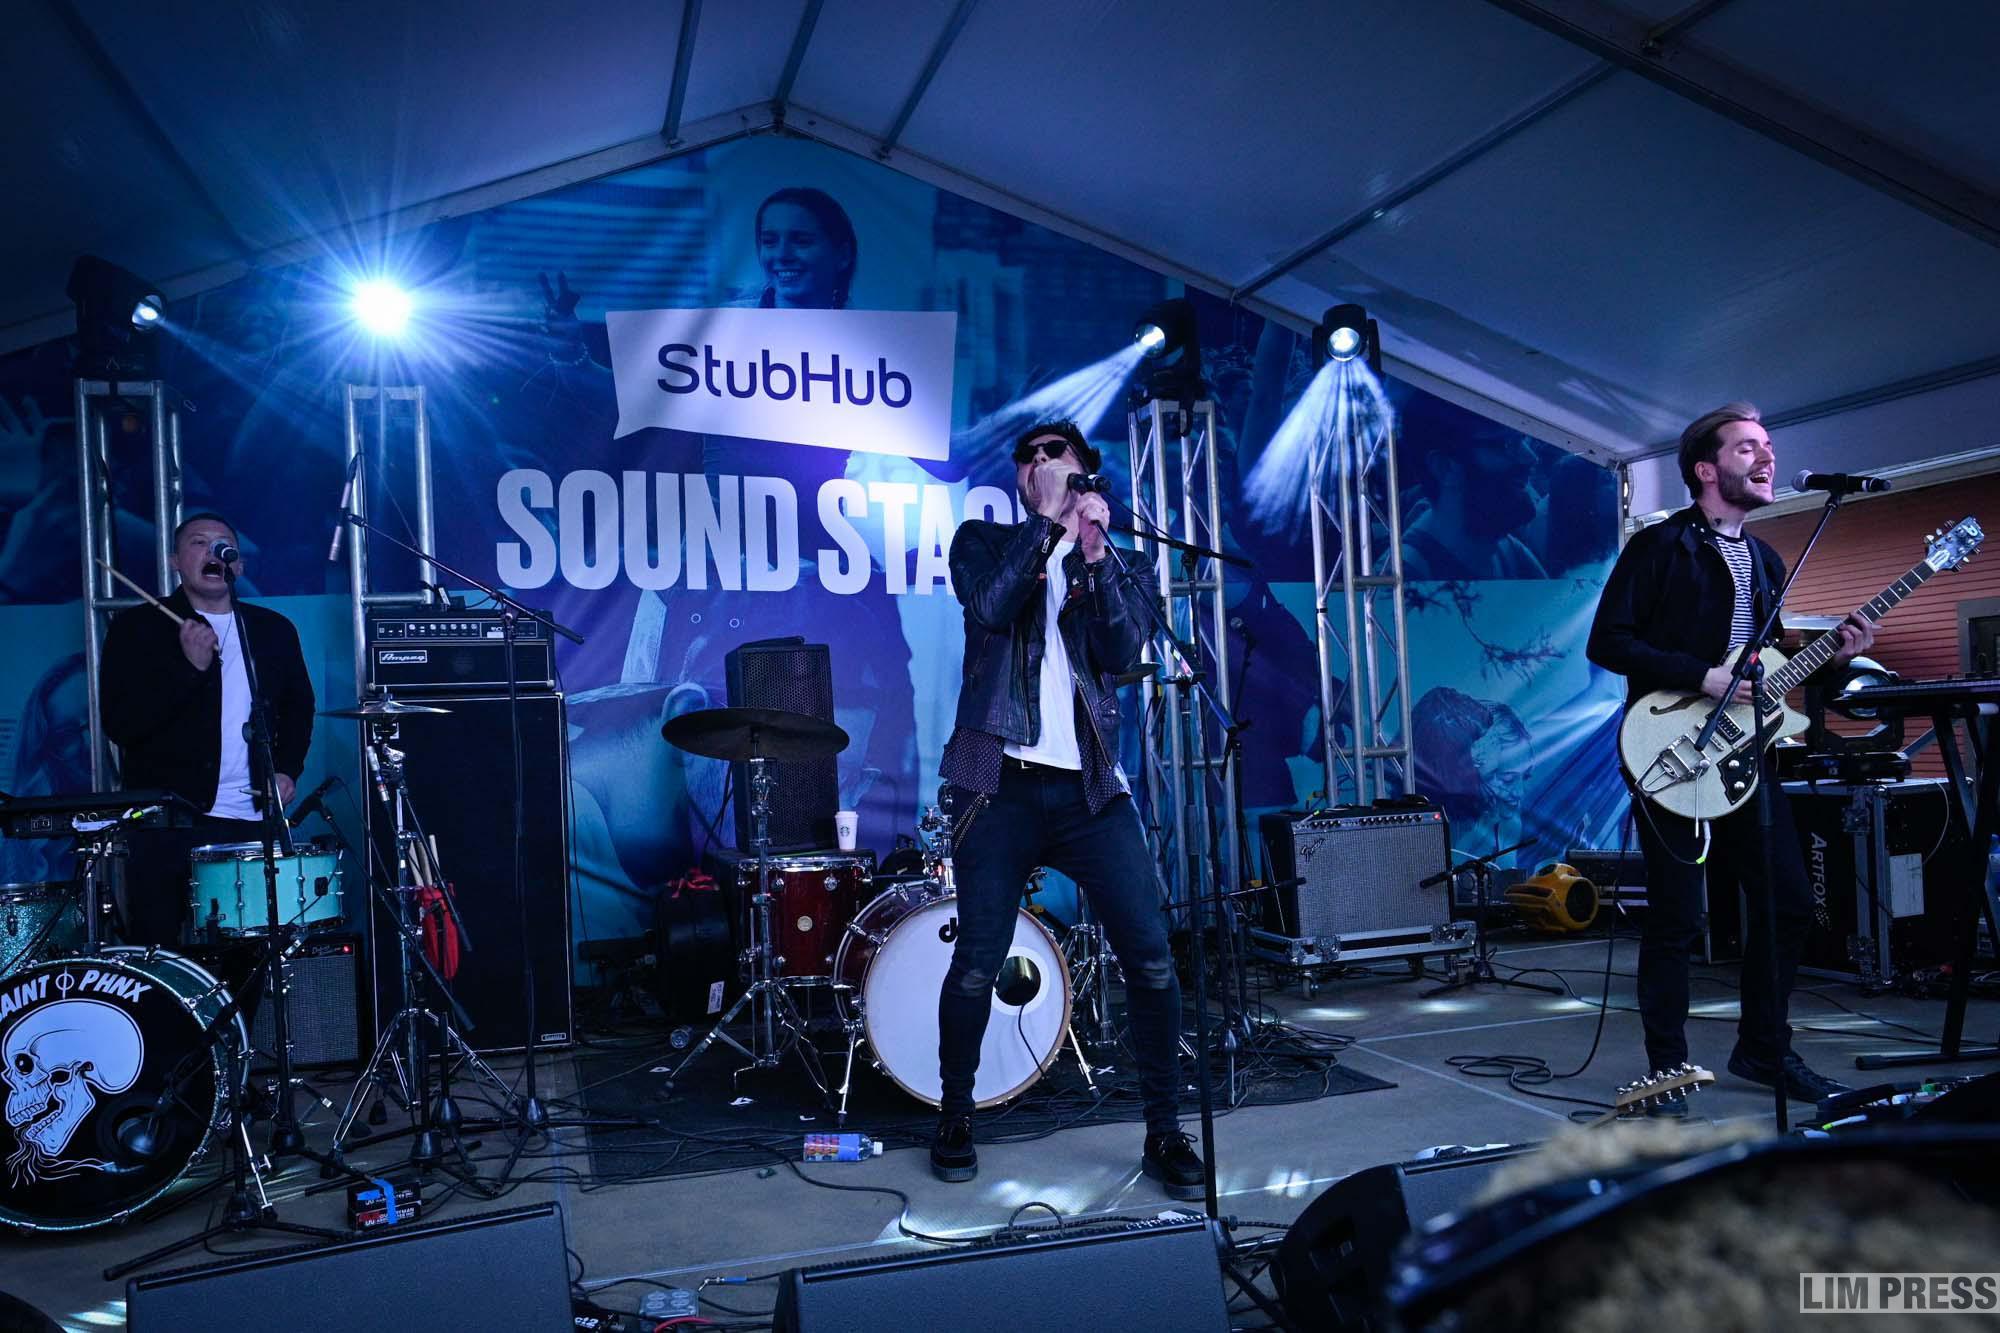 SXSW Music Festival 2019 ライヴレポート Part 1